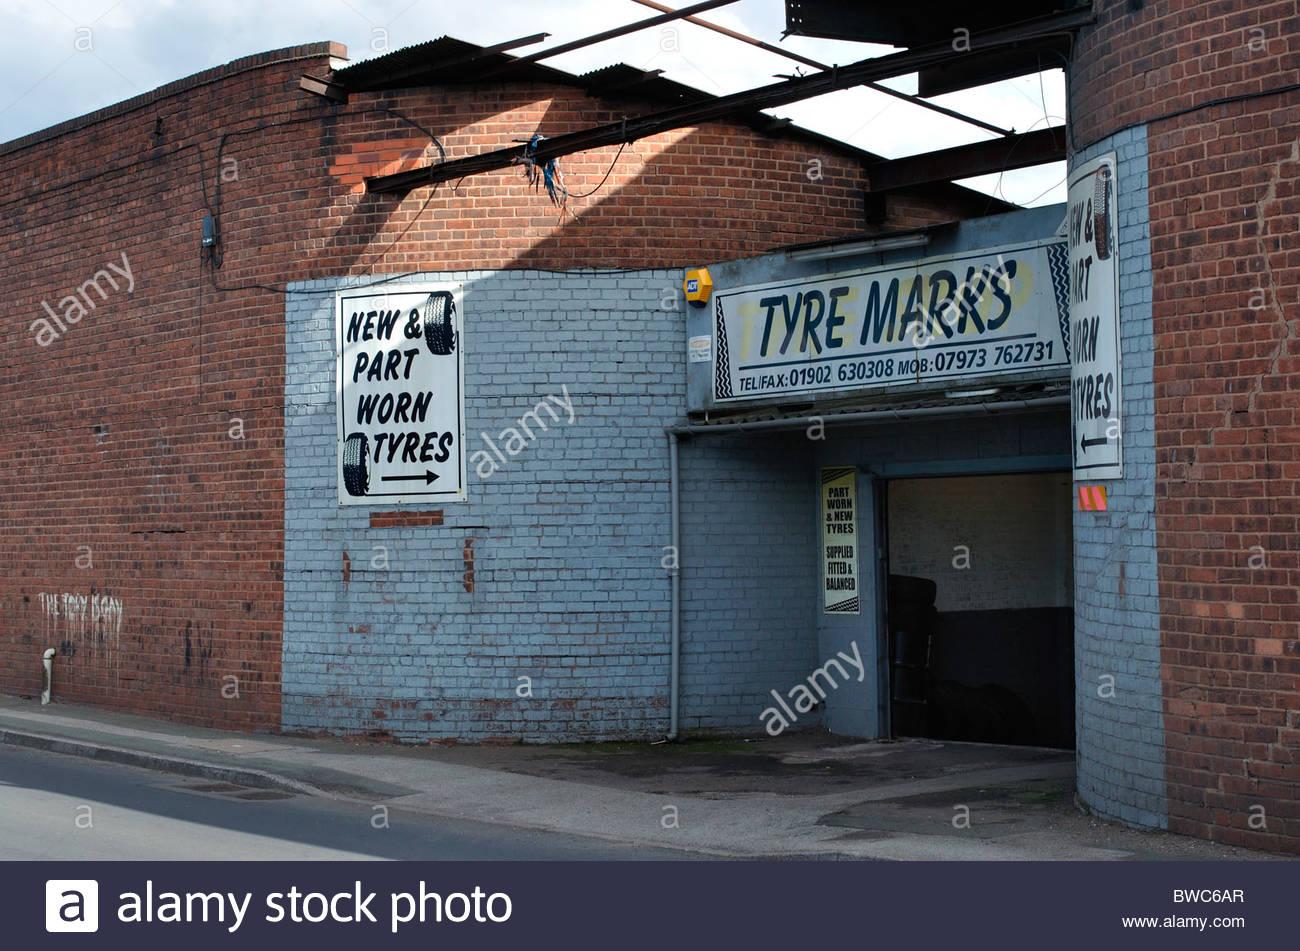 Tyre warehouse selling part worn tyres, Wolverhampton, West Midlands - Stock Image